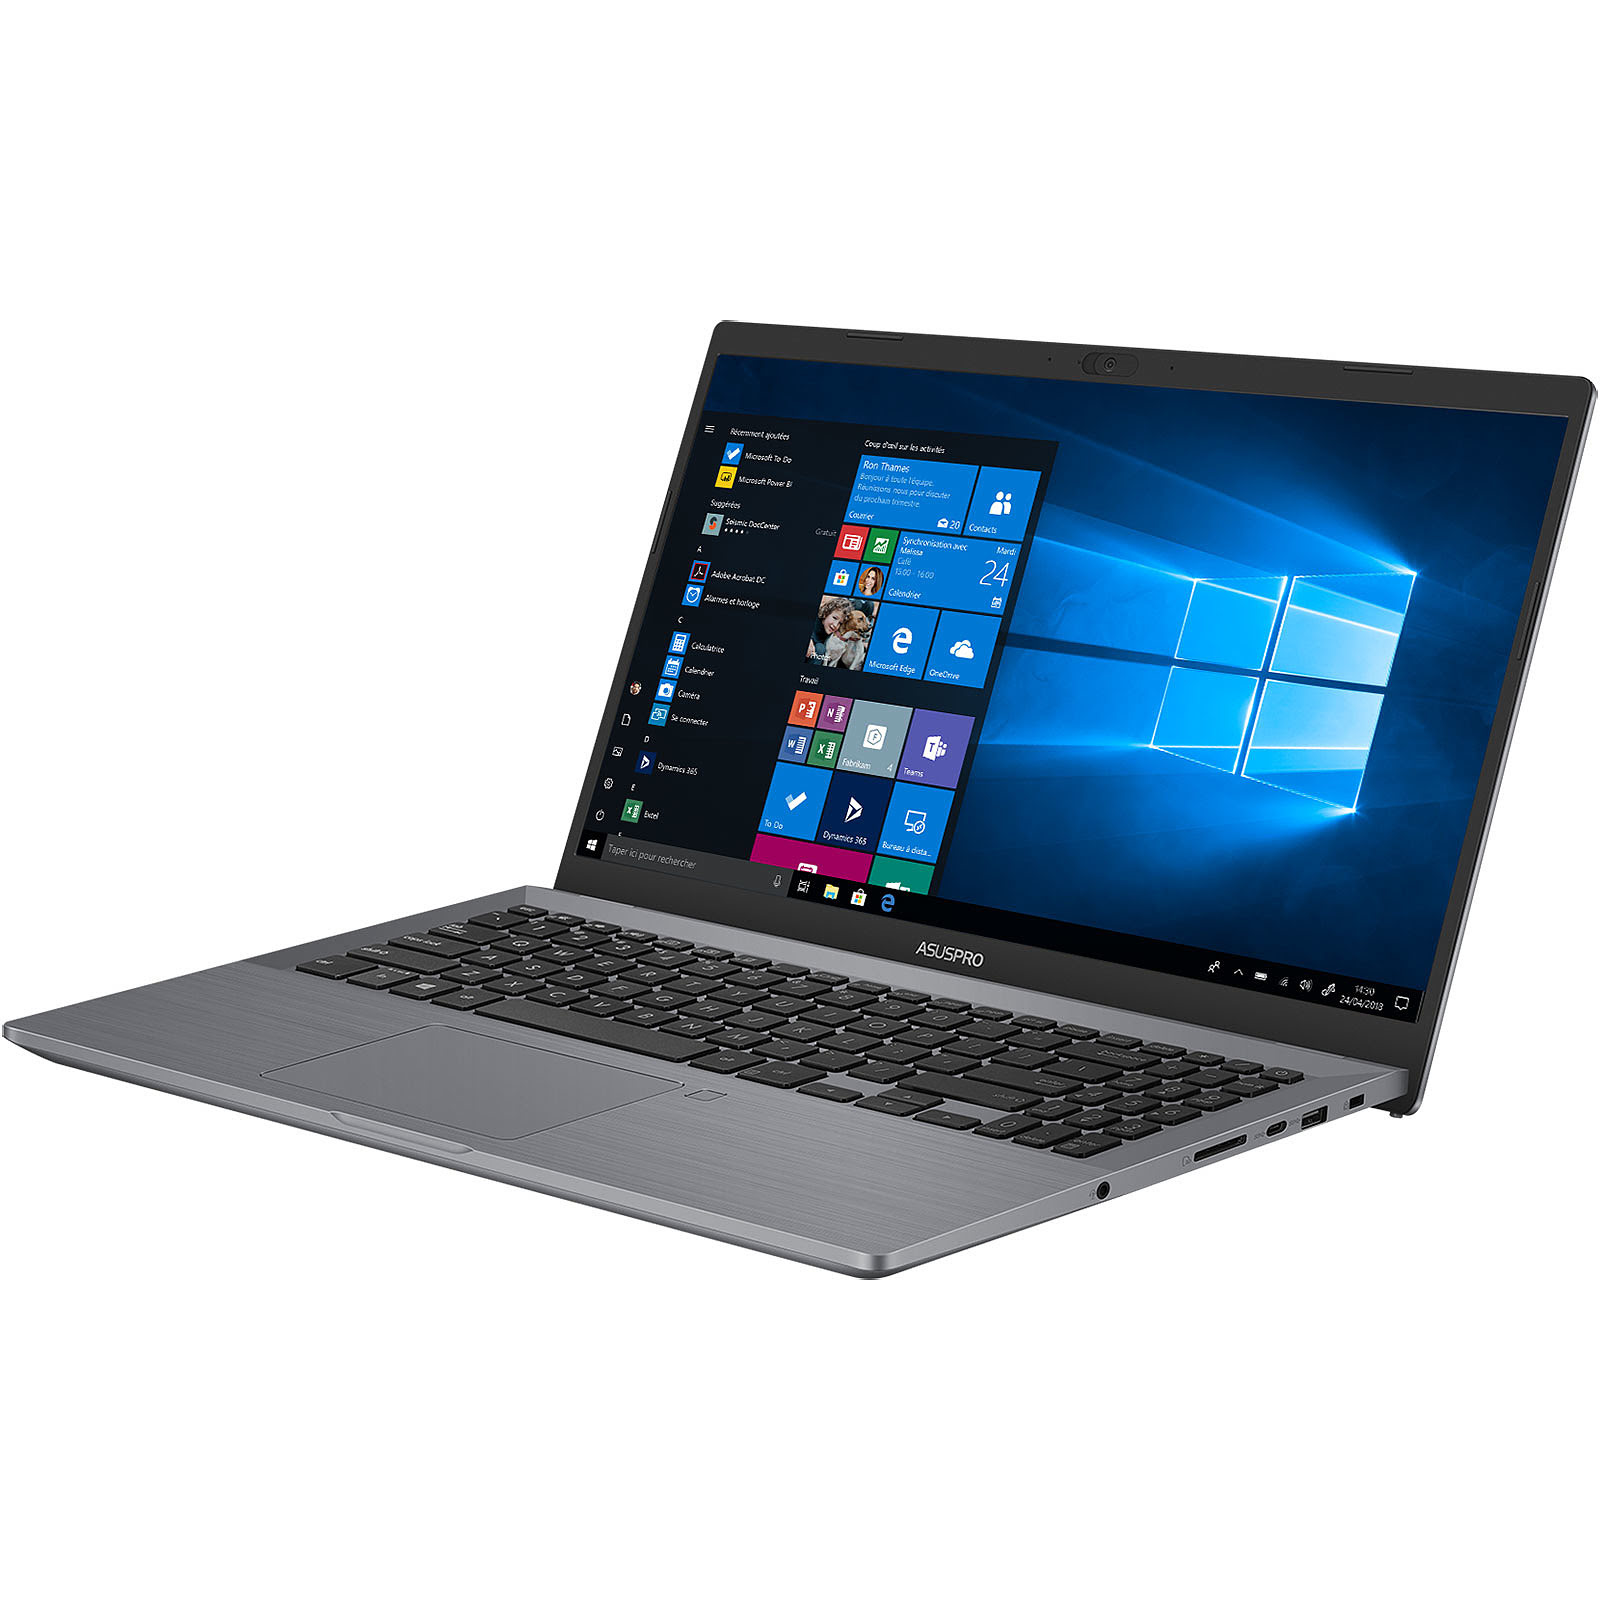 Asus 90NX0261-M12370 -- - PC portable Asus - Cybertek.fr - 3